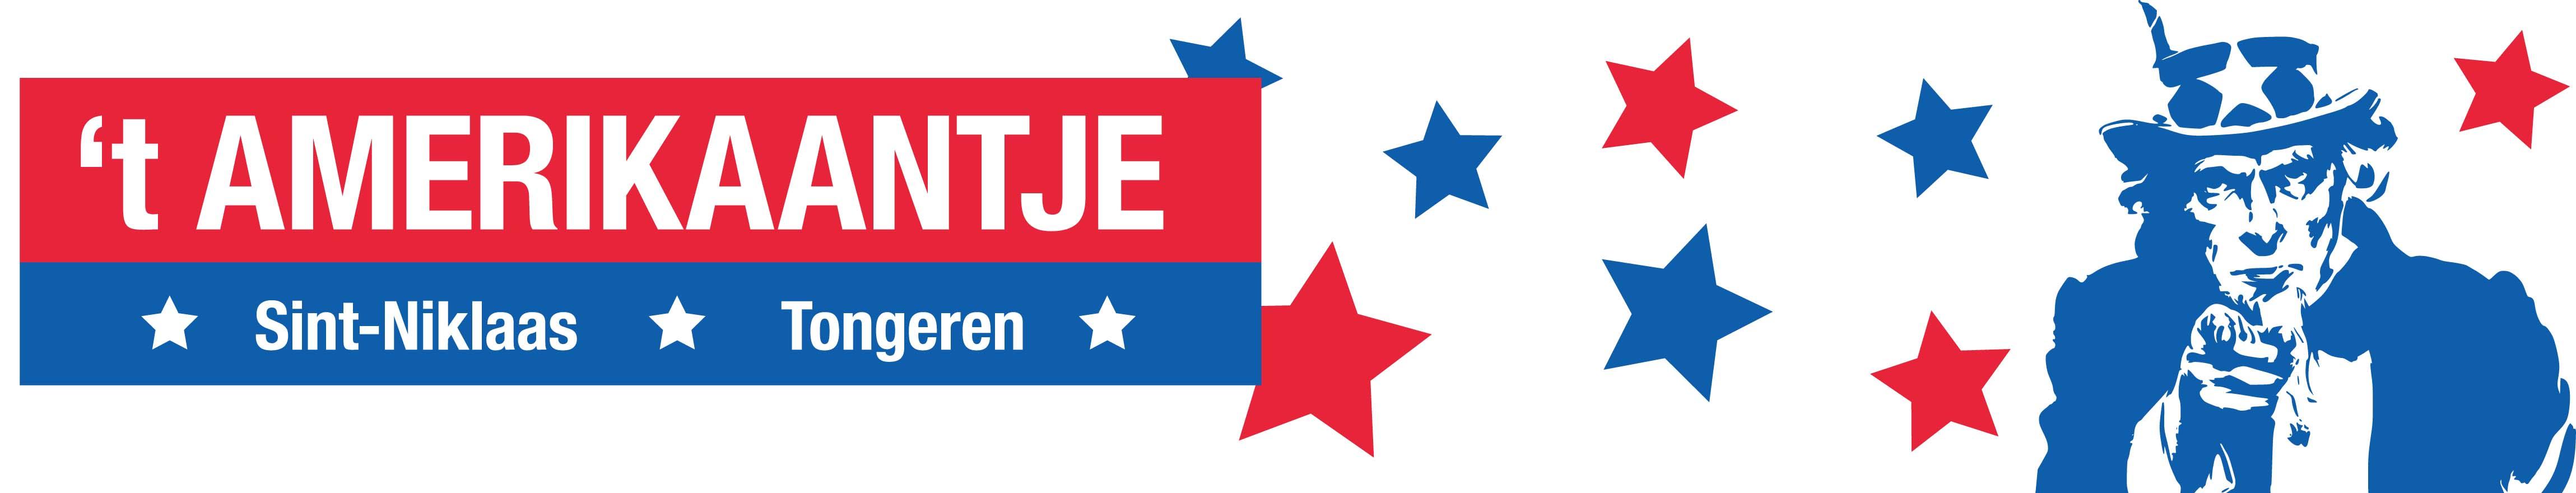 Logo 't Amerikaantje